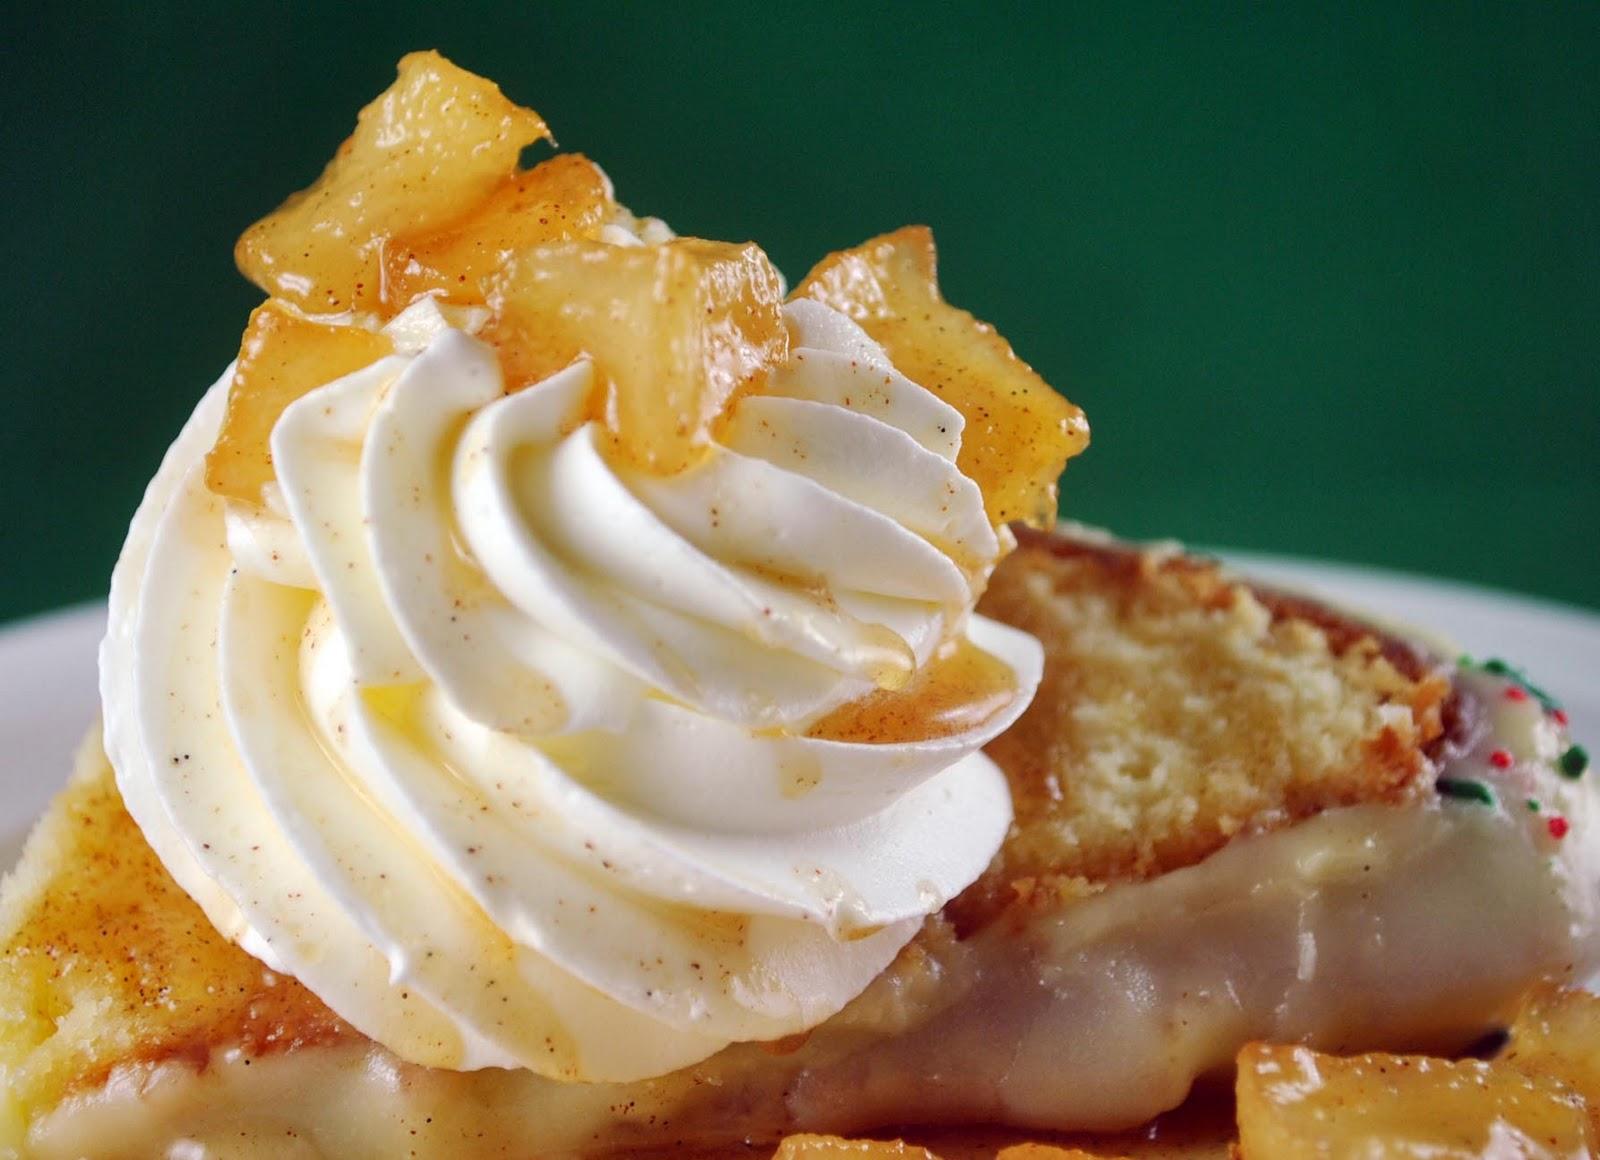 Lemon Glazed Vanilla Bean Cream Cheese Pound Cake with Whipped Cream ...